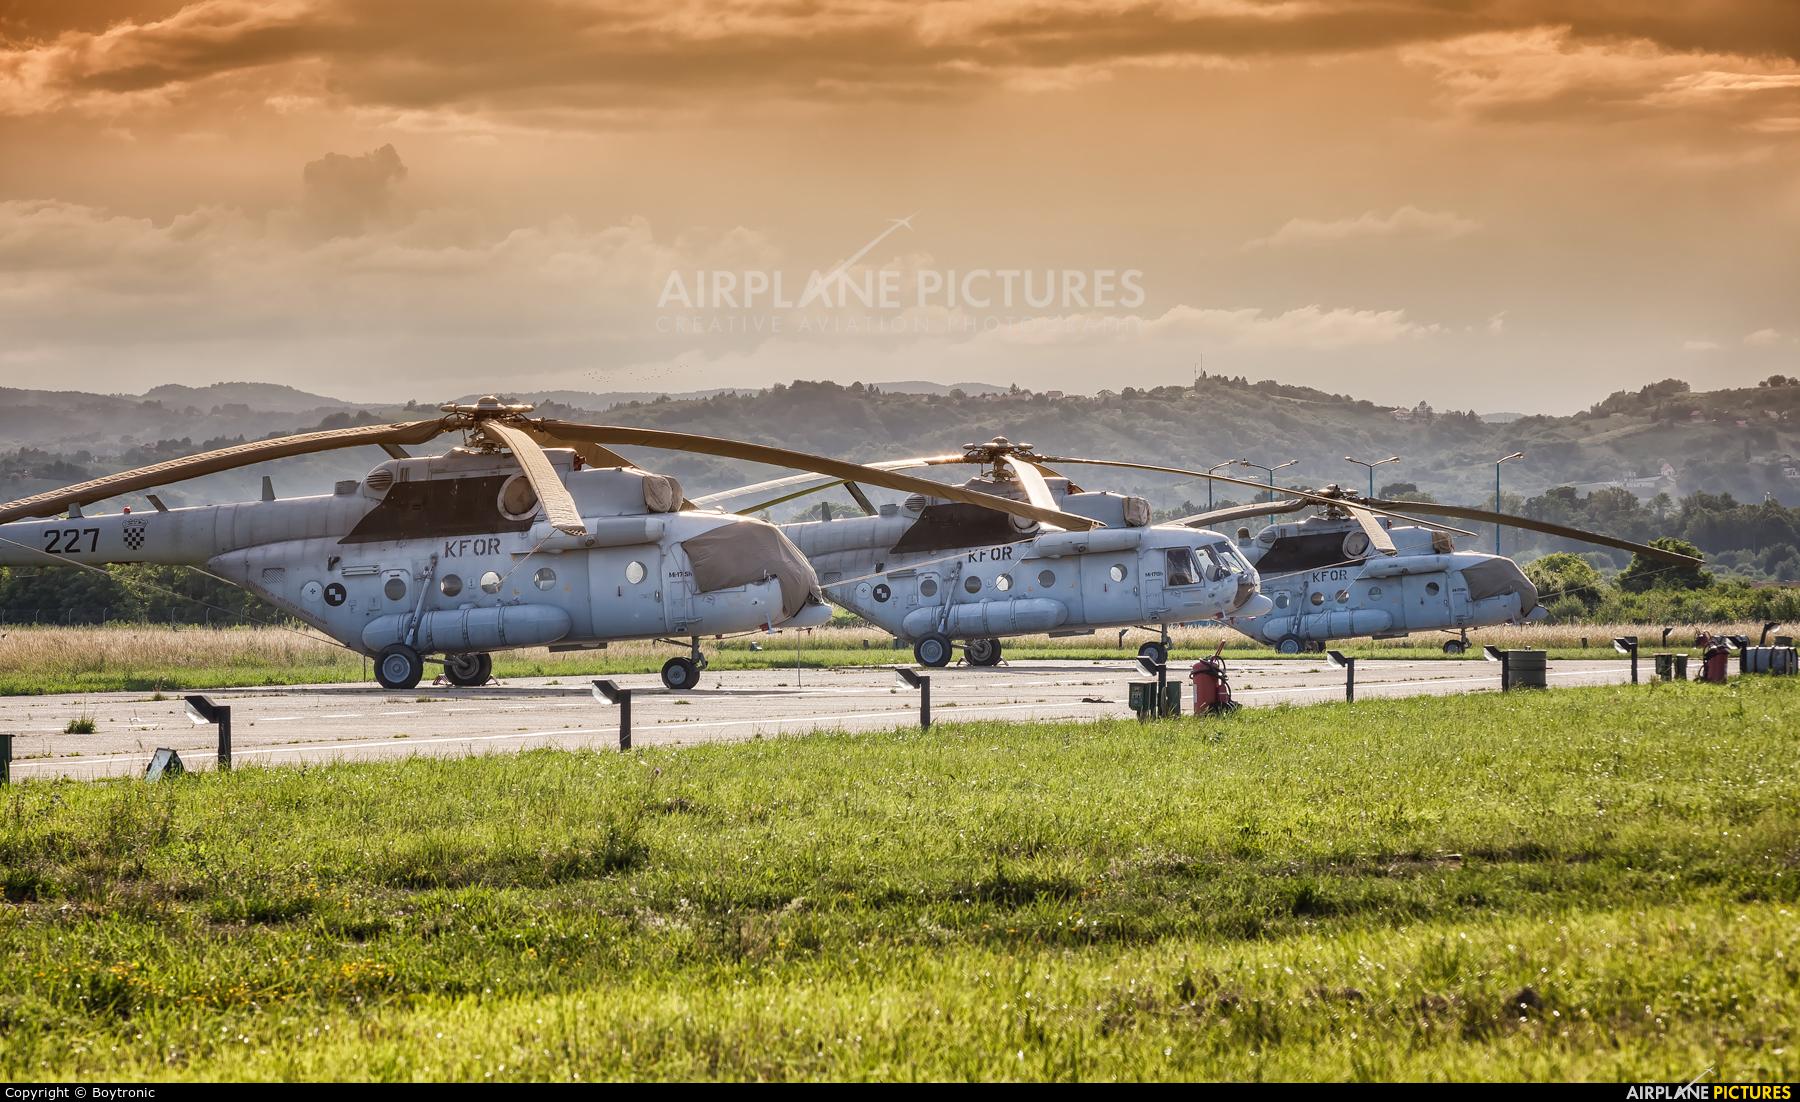 Croatia - Air Force 227 aircraft at Lučko